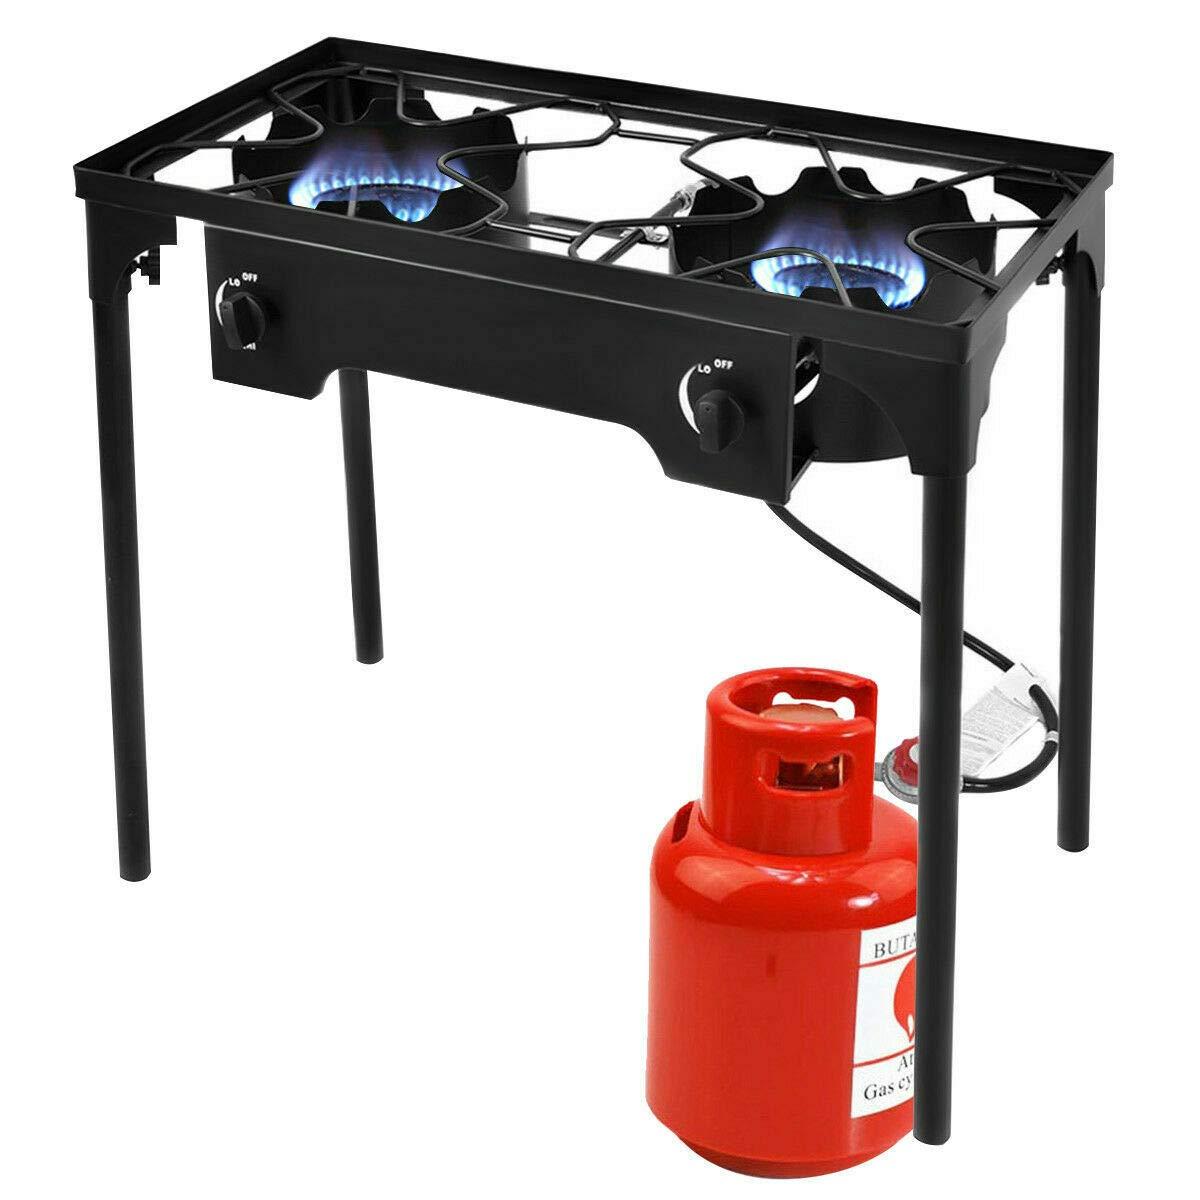 Giantex Outdoor 2 Burner Stove High Pressure Camping Picnic Burner Stand 150,000 BTU with 0-20 PSI Adjustable Regulator Portable Double Burner Stove, Black